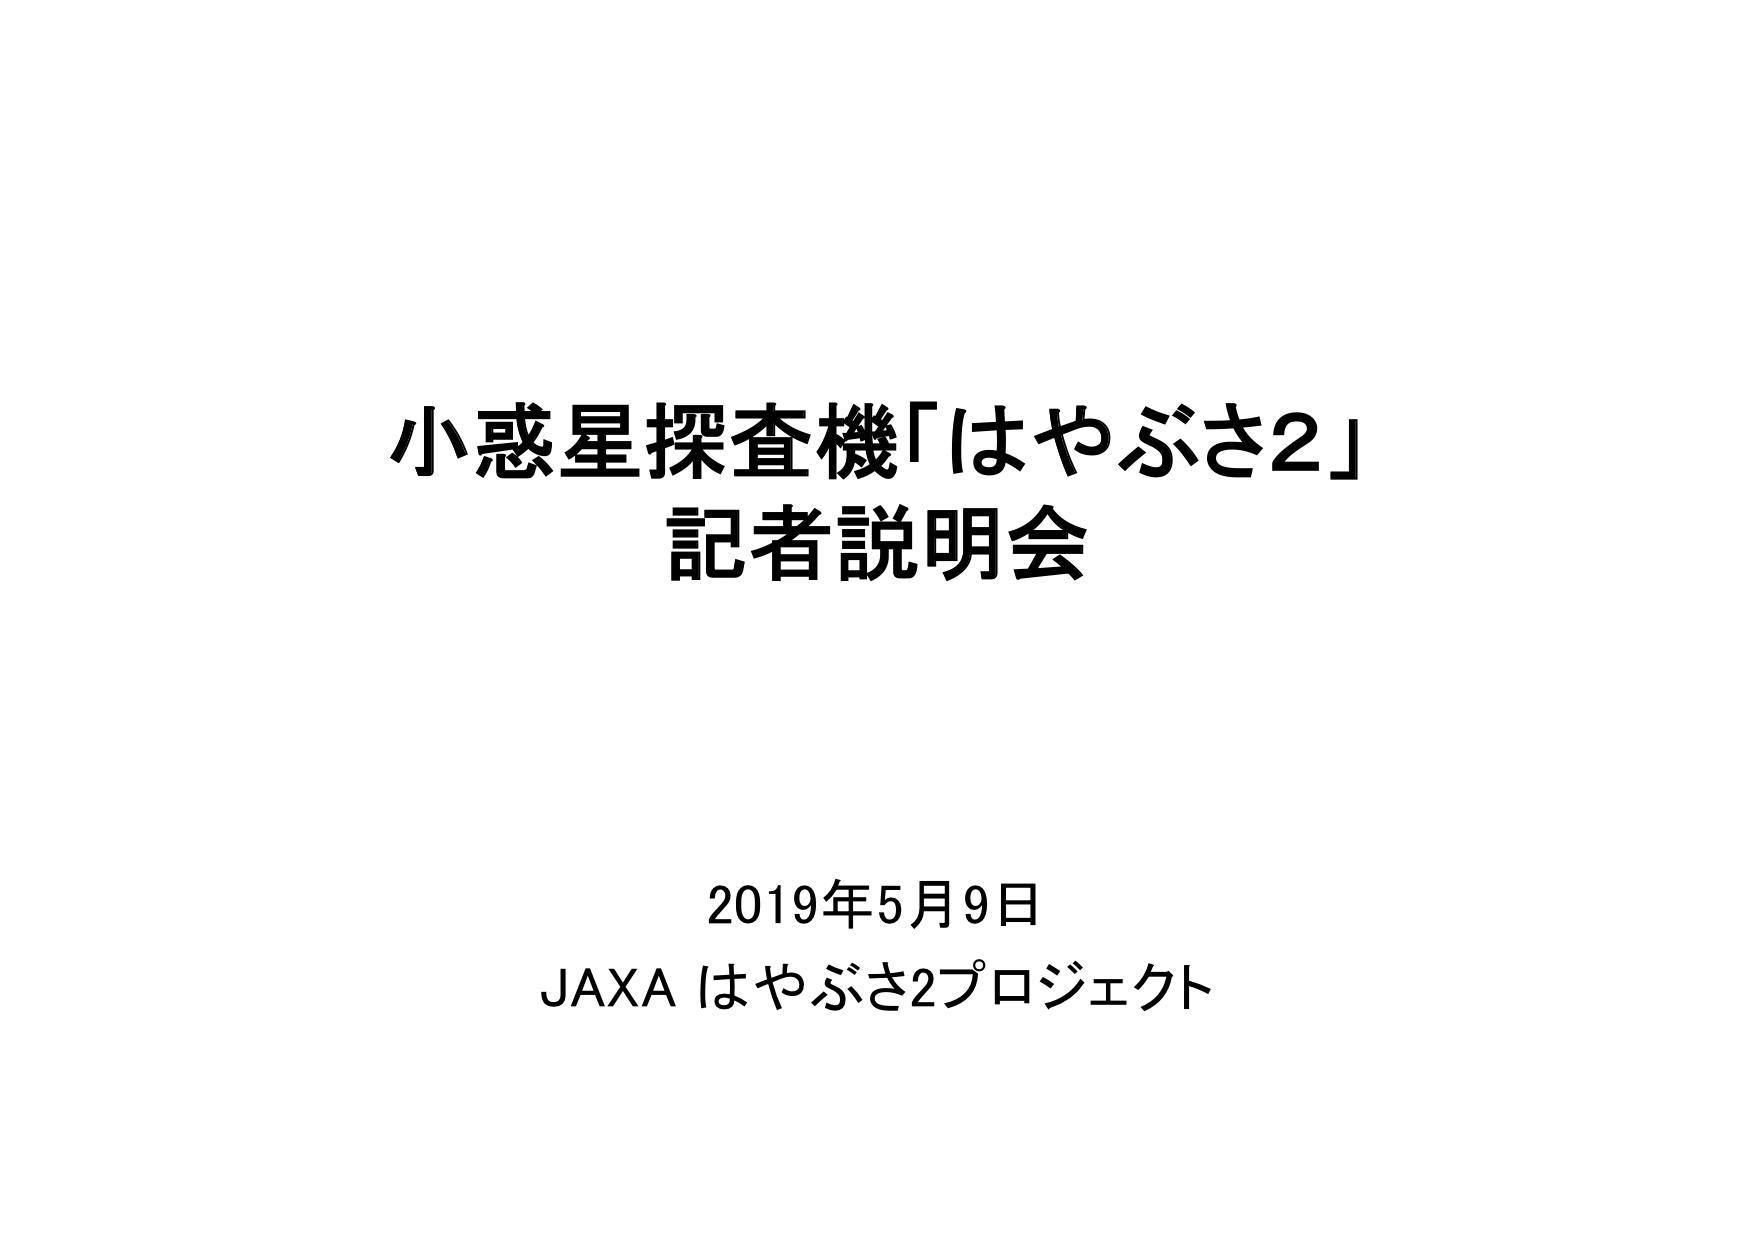 f:id:Imamura:20190509154357p:plain